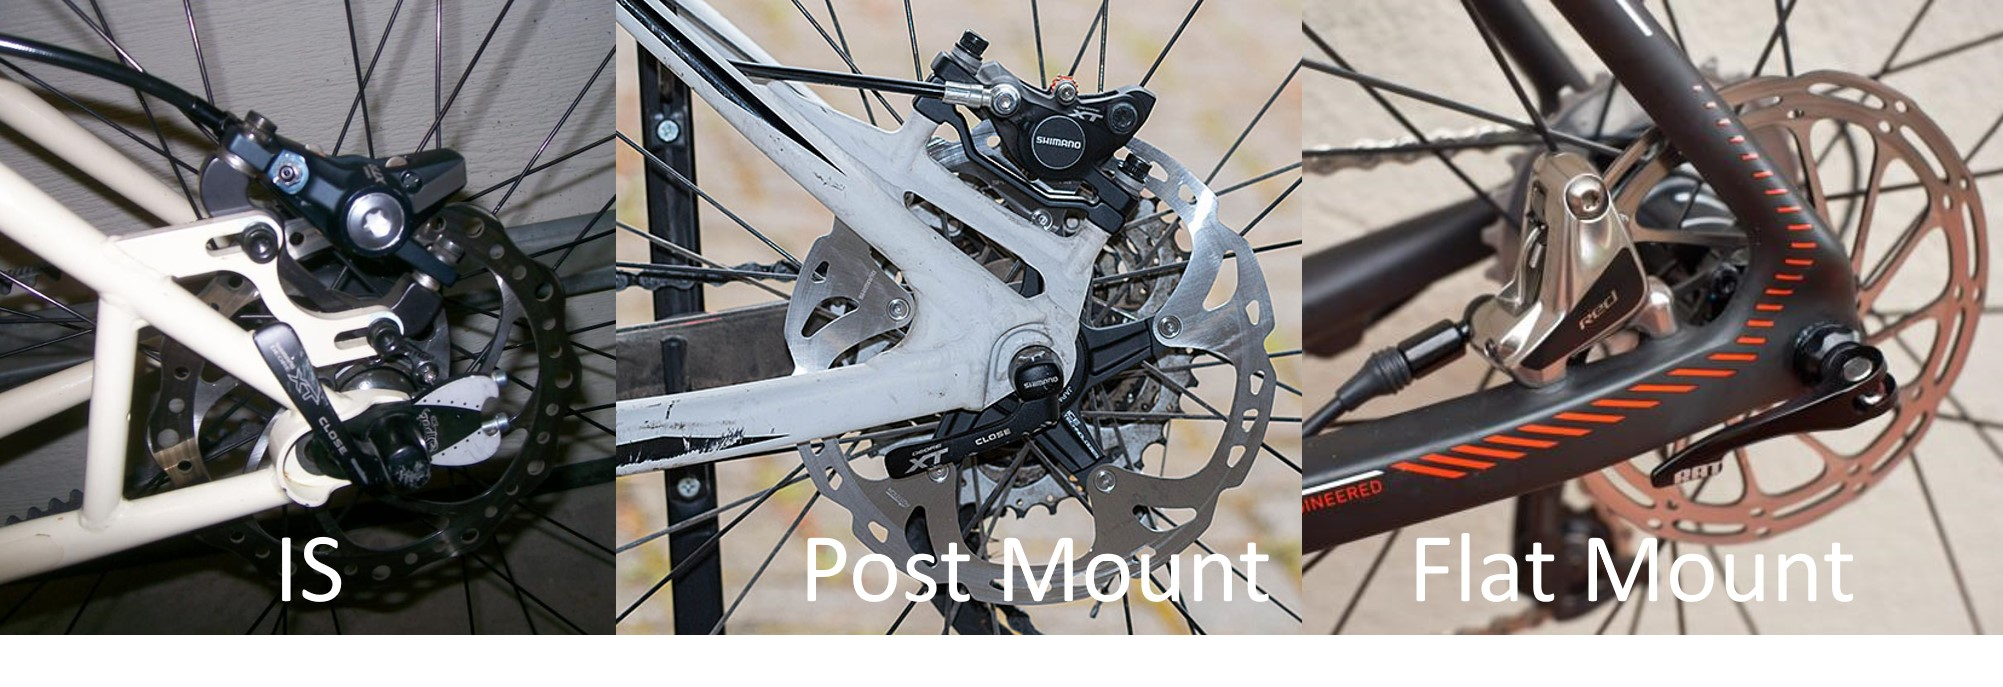 Jenis mounting disc brake pada frame sepeda